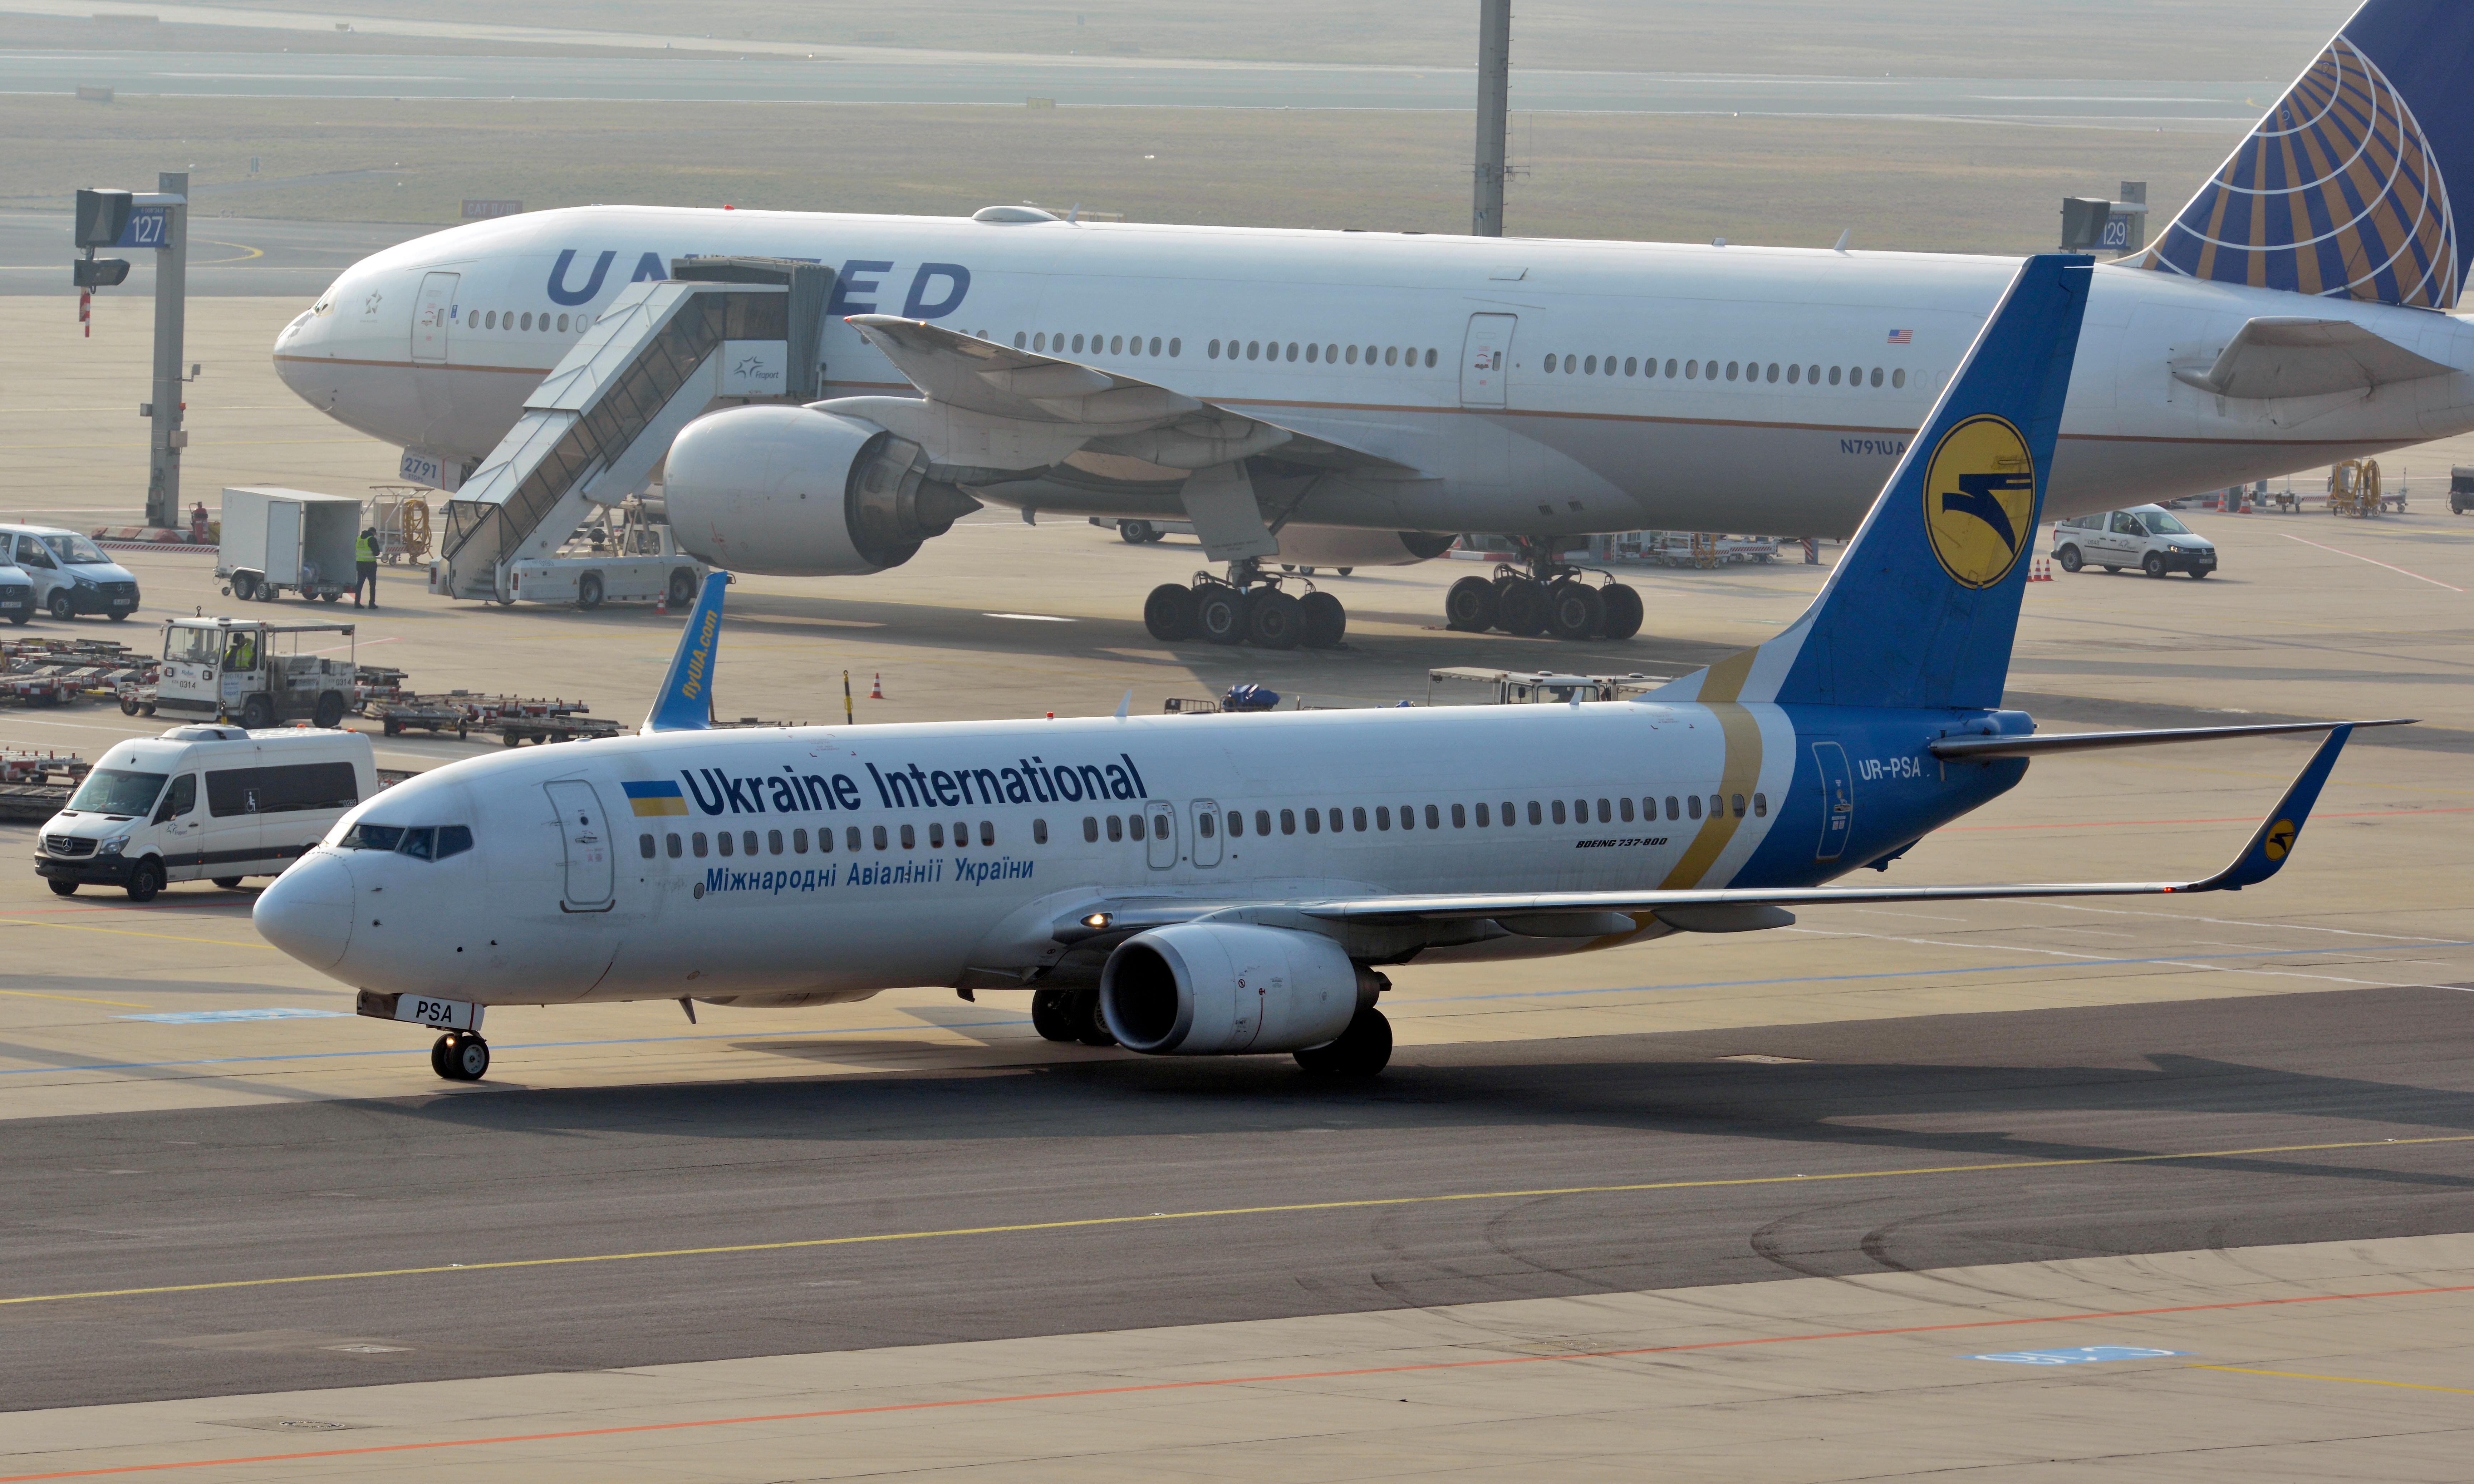 Boeing 737-800 that crashed in Tehran 'most popular model in skies'